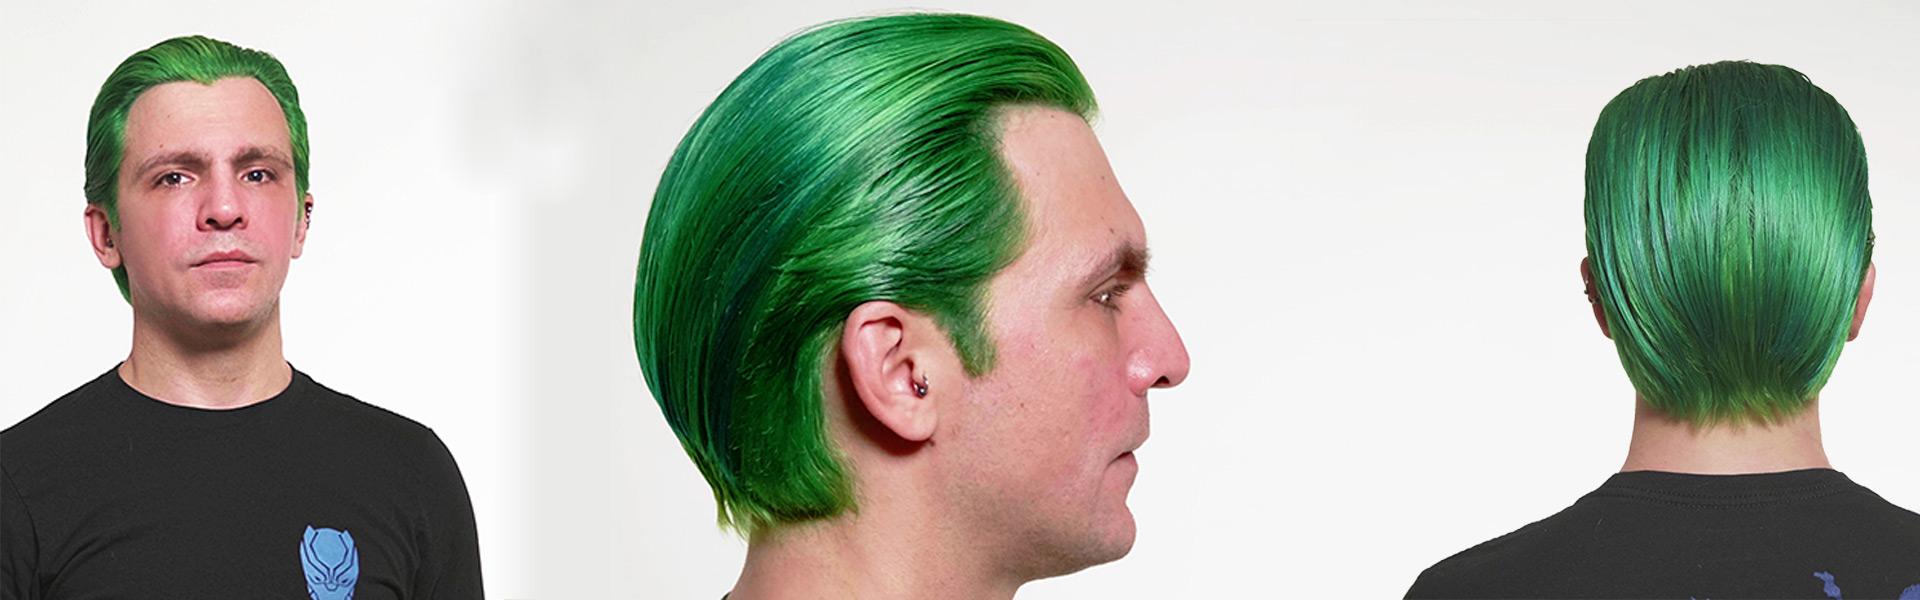 globalfaerbung modell grüne haare